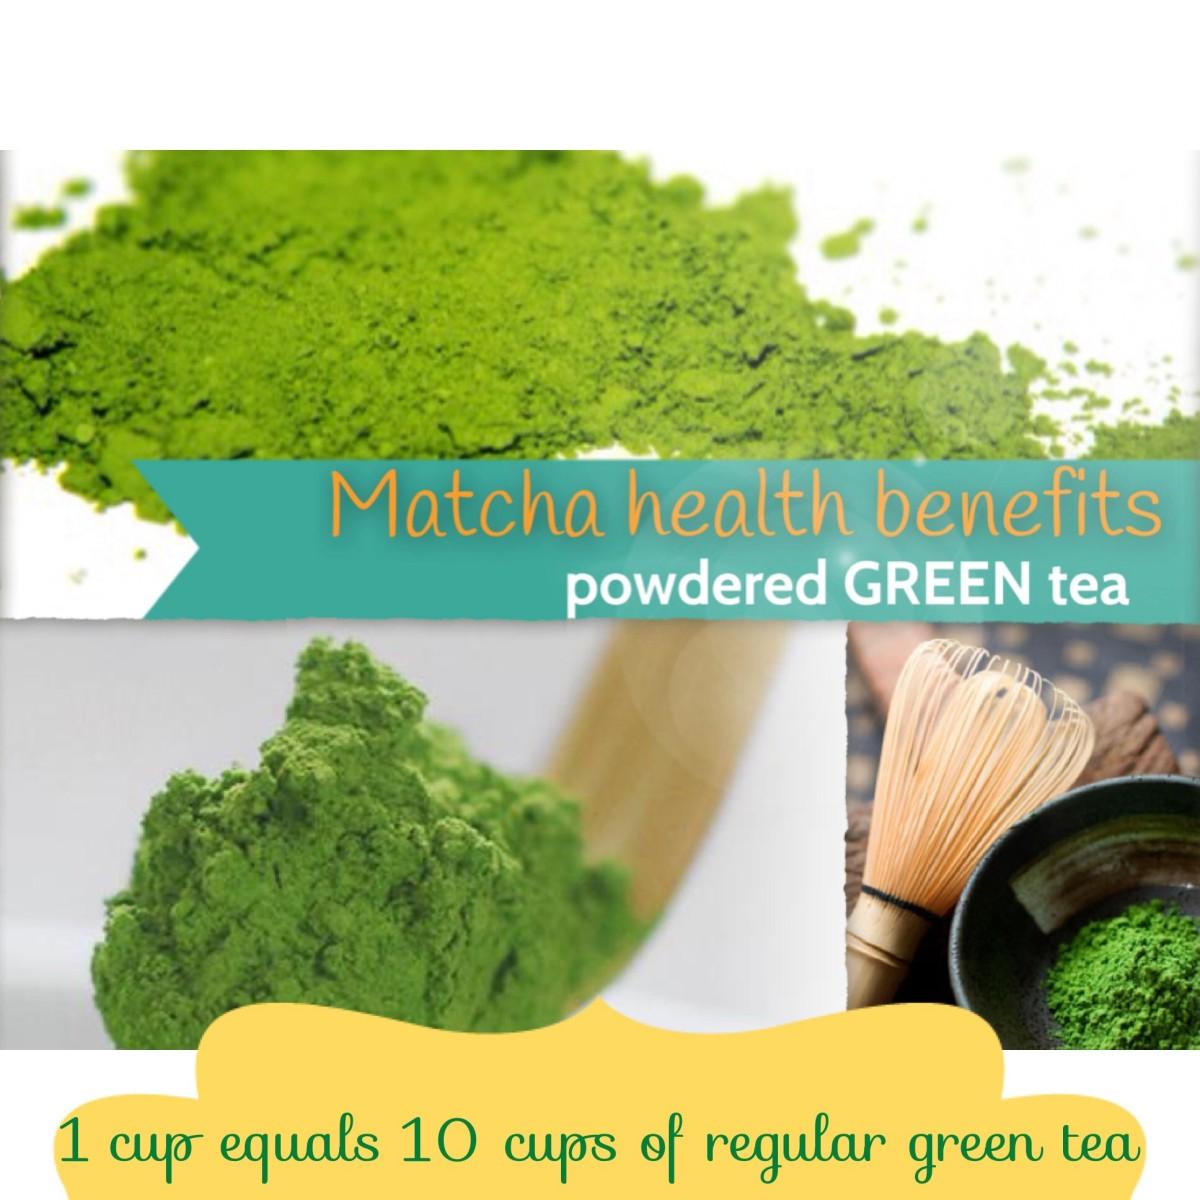 Health Benefits of Matcha: Green Tea Powder